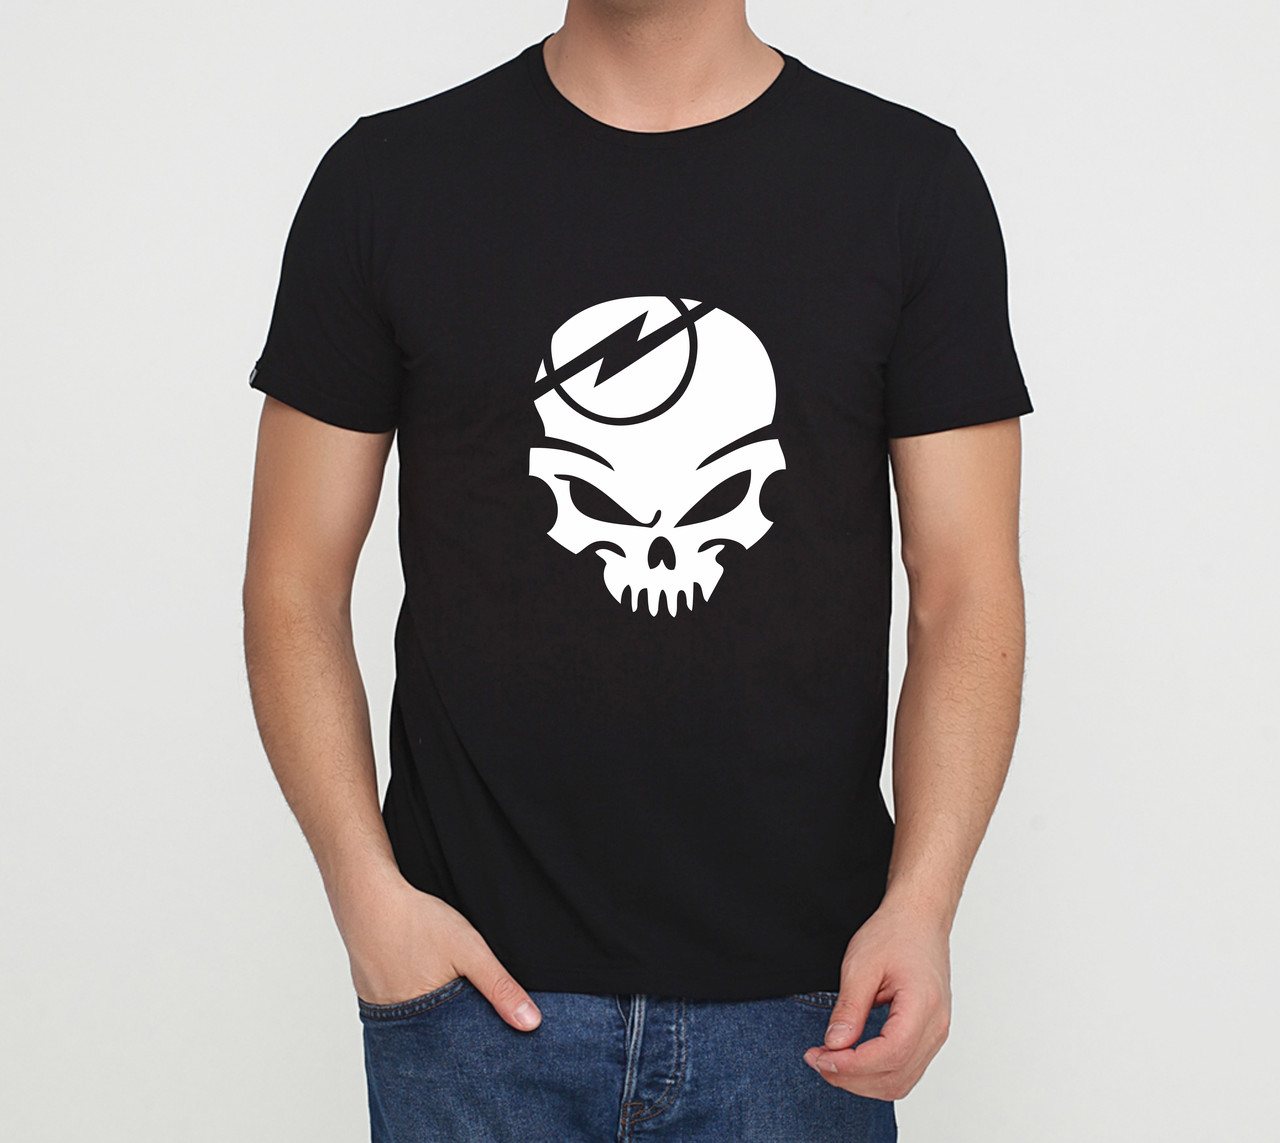 Футболка Opel skull черная